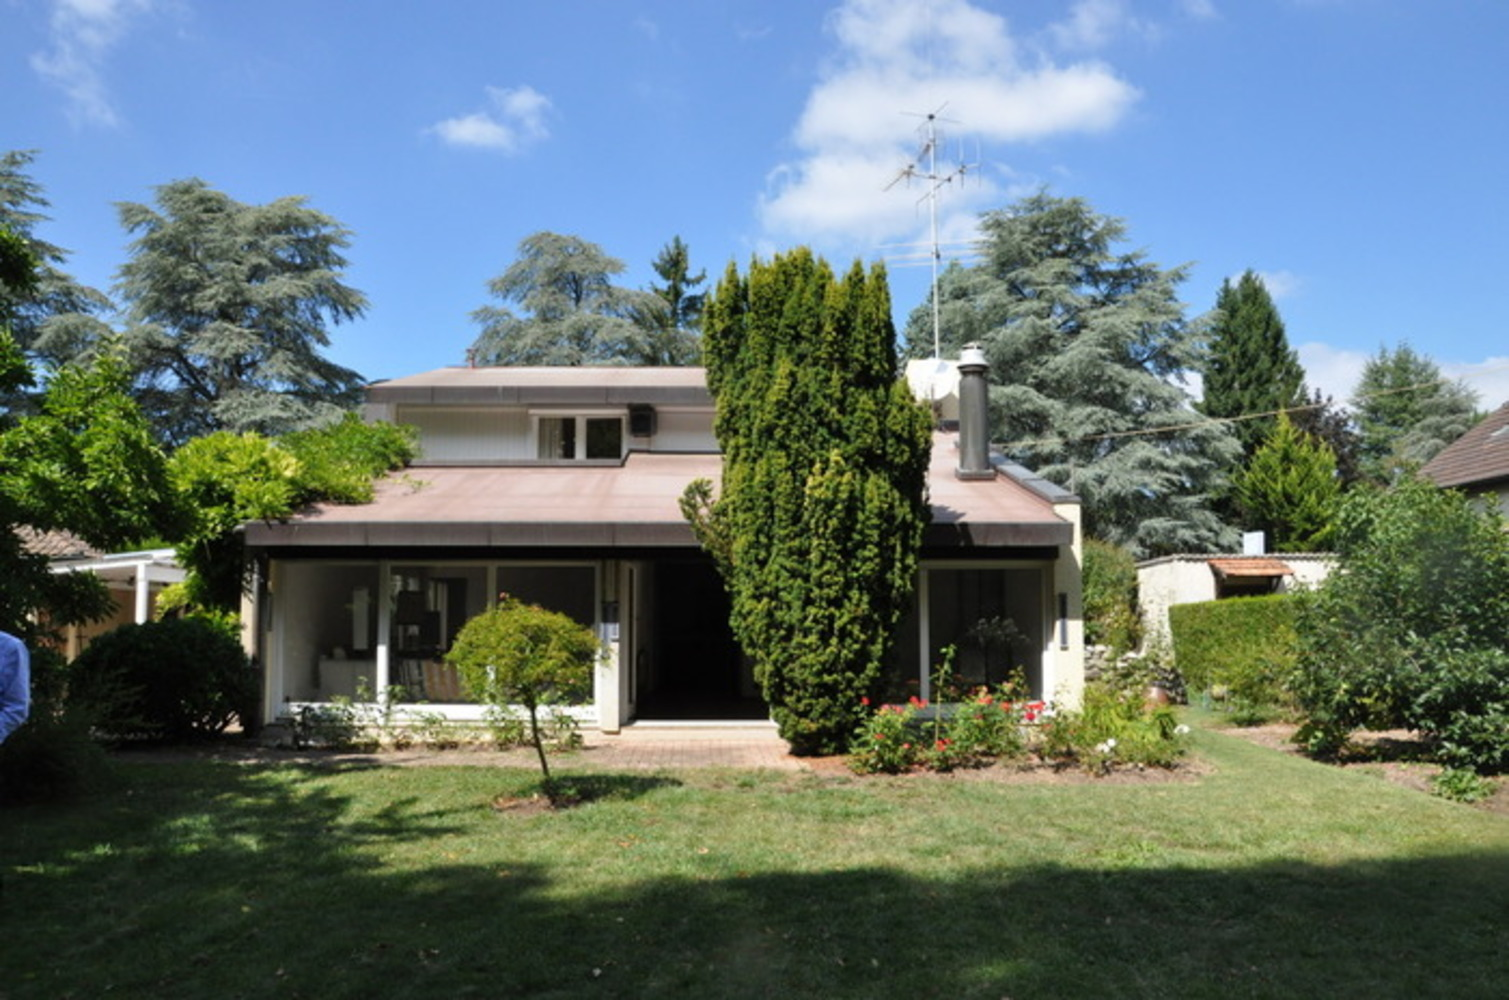 Maison d 39 architecte avec joli jardin arbor for Architecte jardin